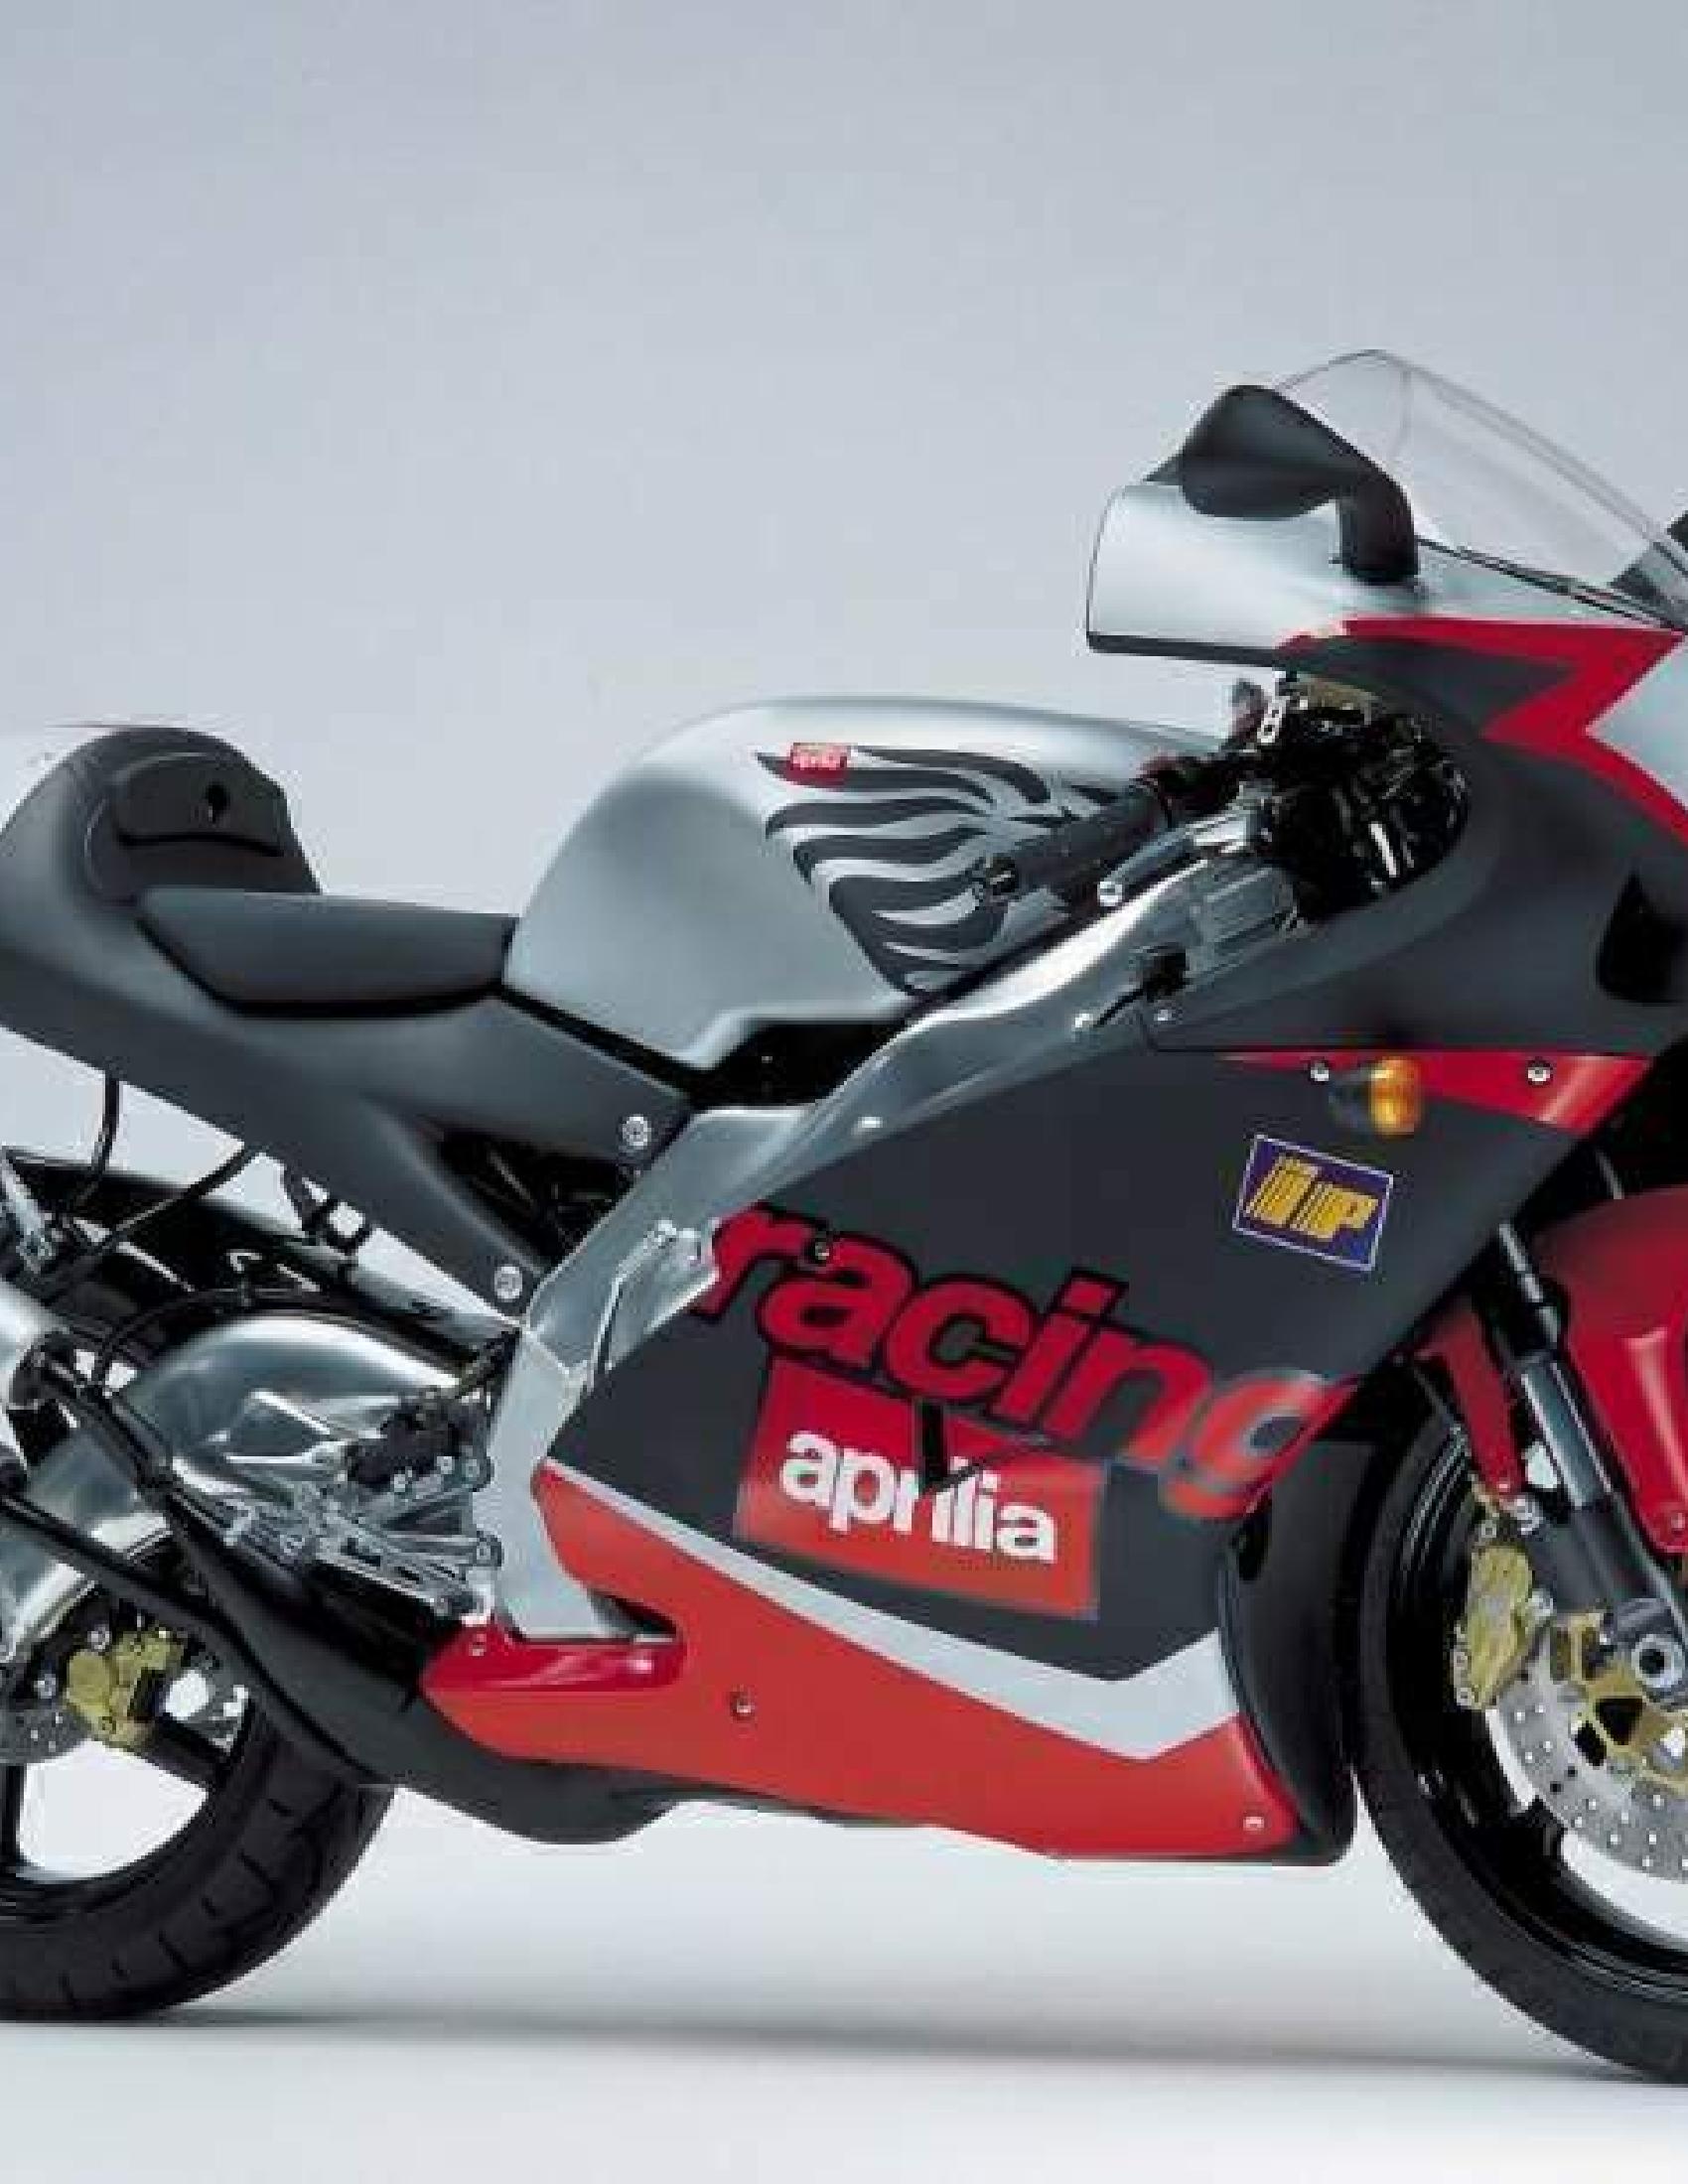 Aprilia RS250 Motorcycle manual